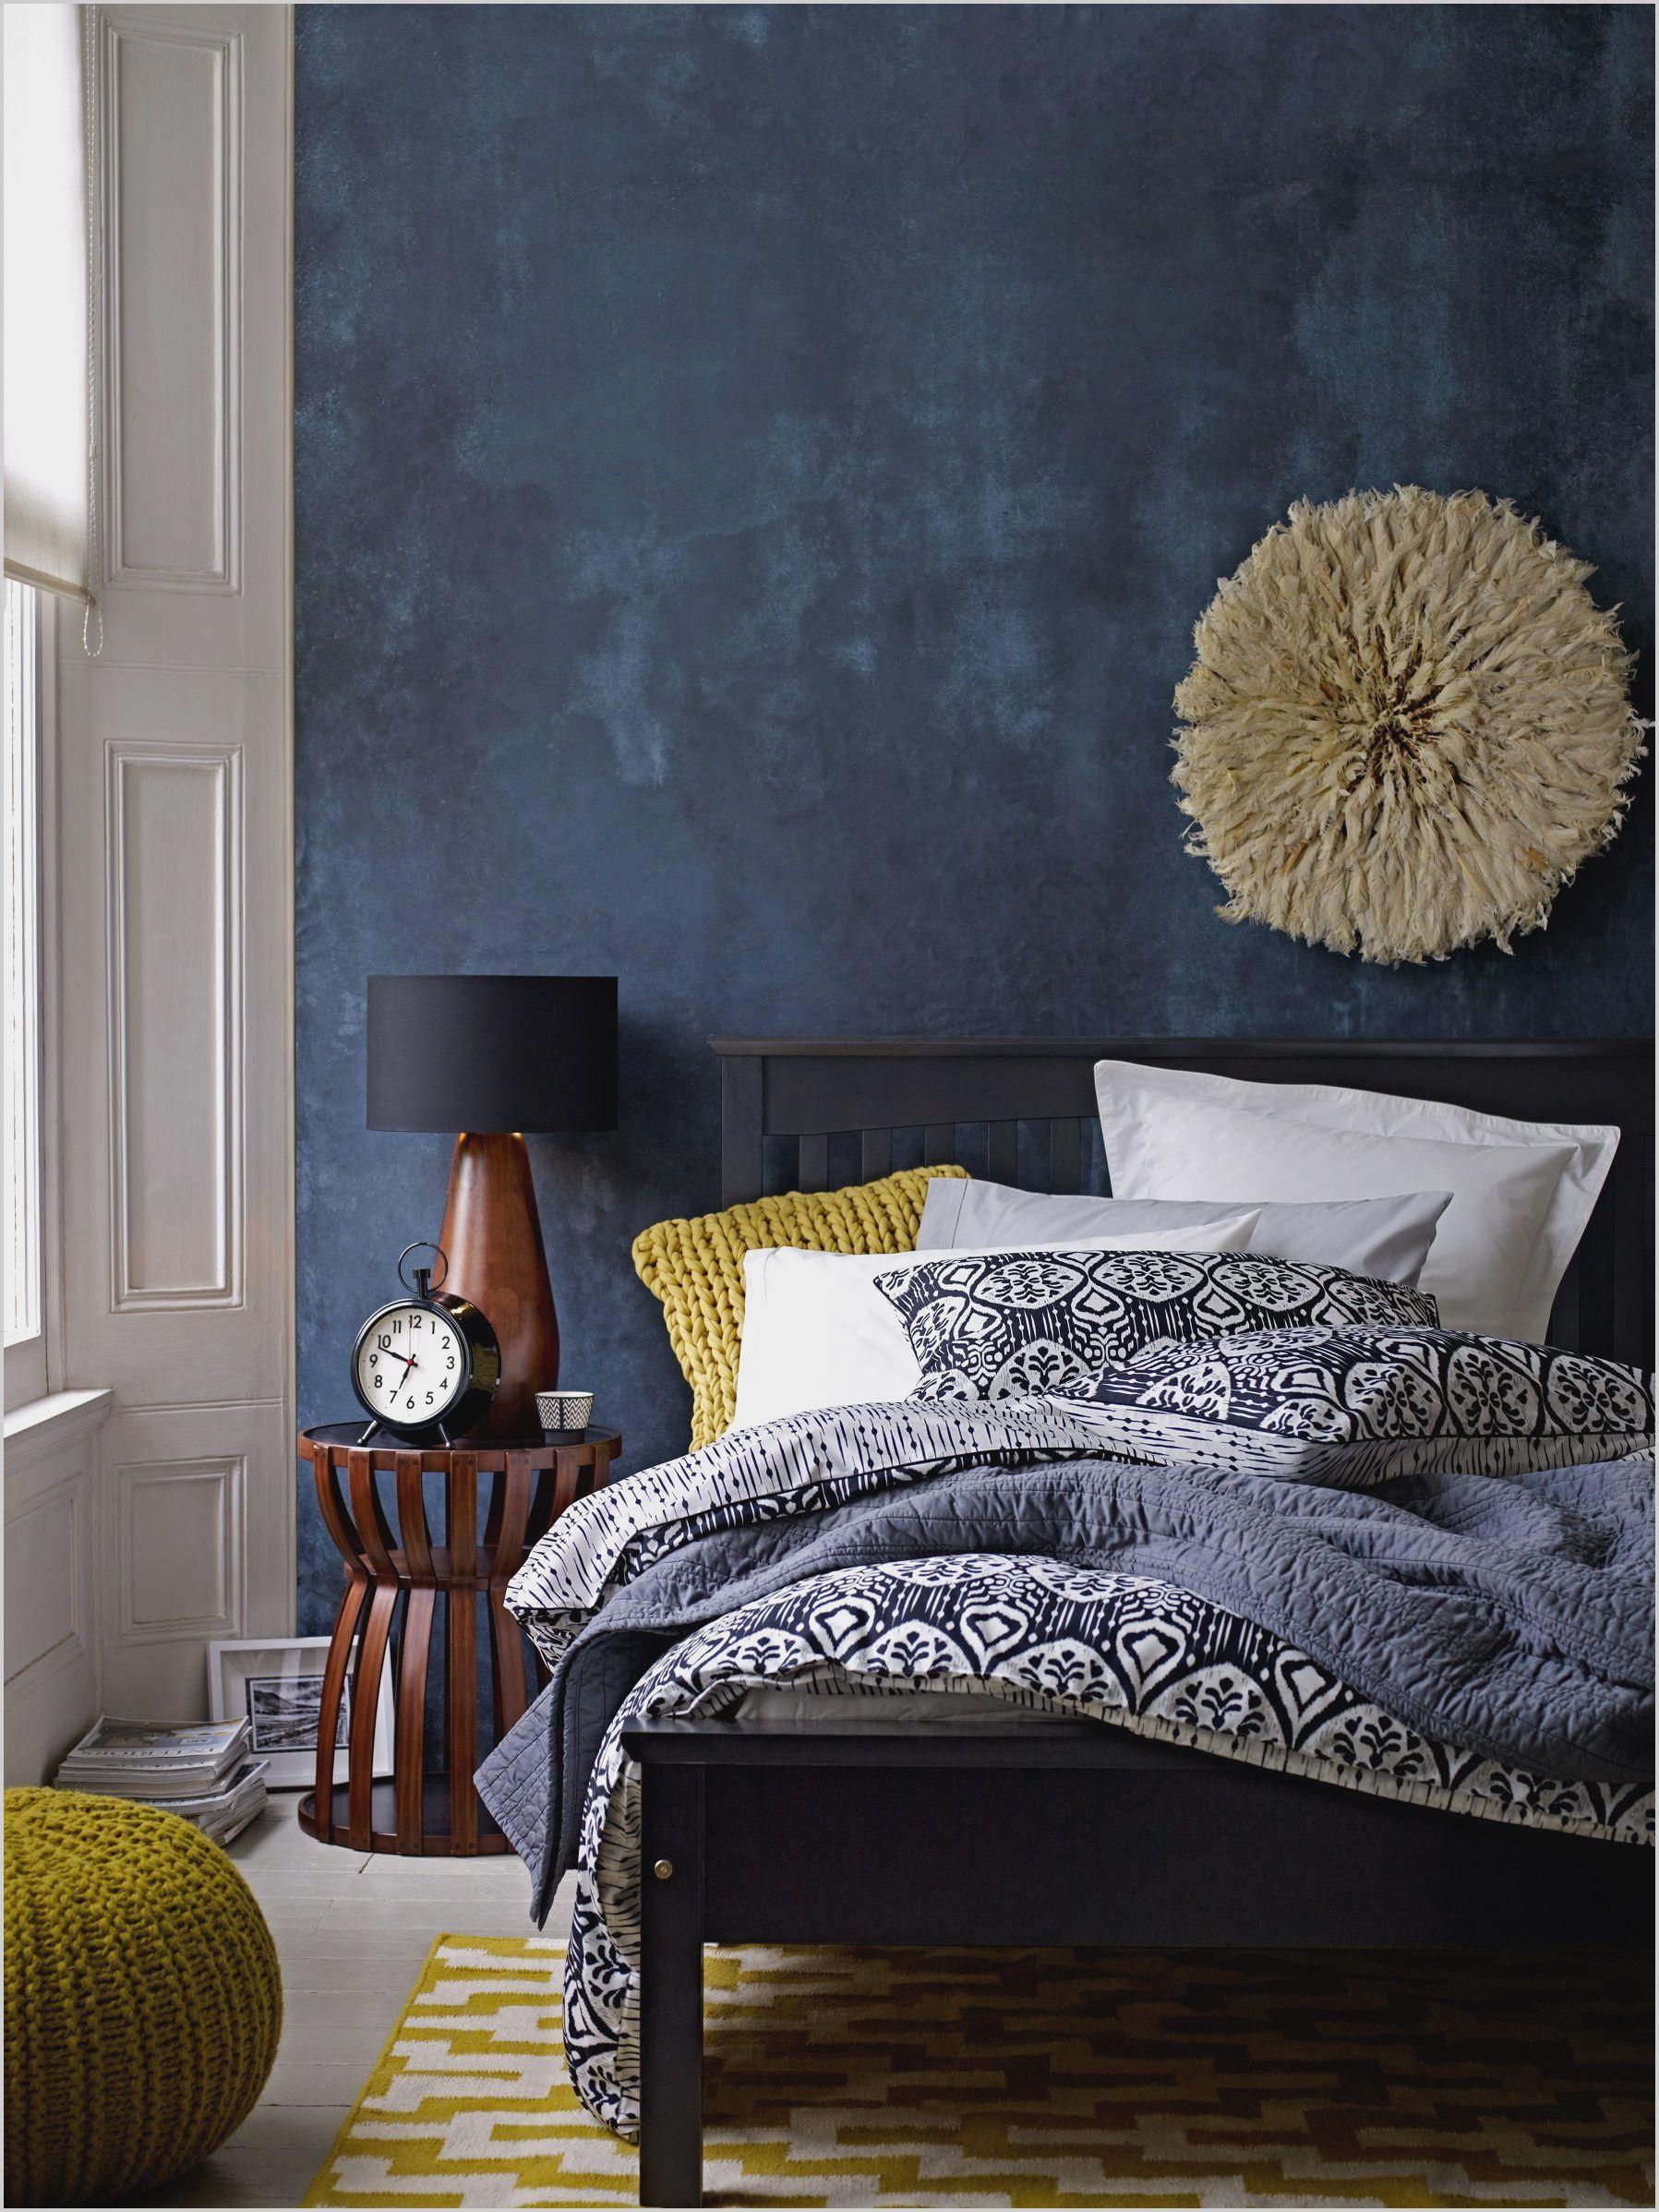 Navy Blue And White Bedroom Design Blue Bedroom Decor Dark Blue Bedrooms Eclectic Bedroom Bedroom ideas design blue